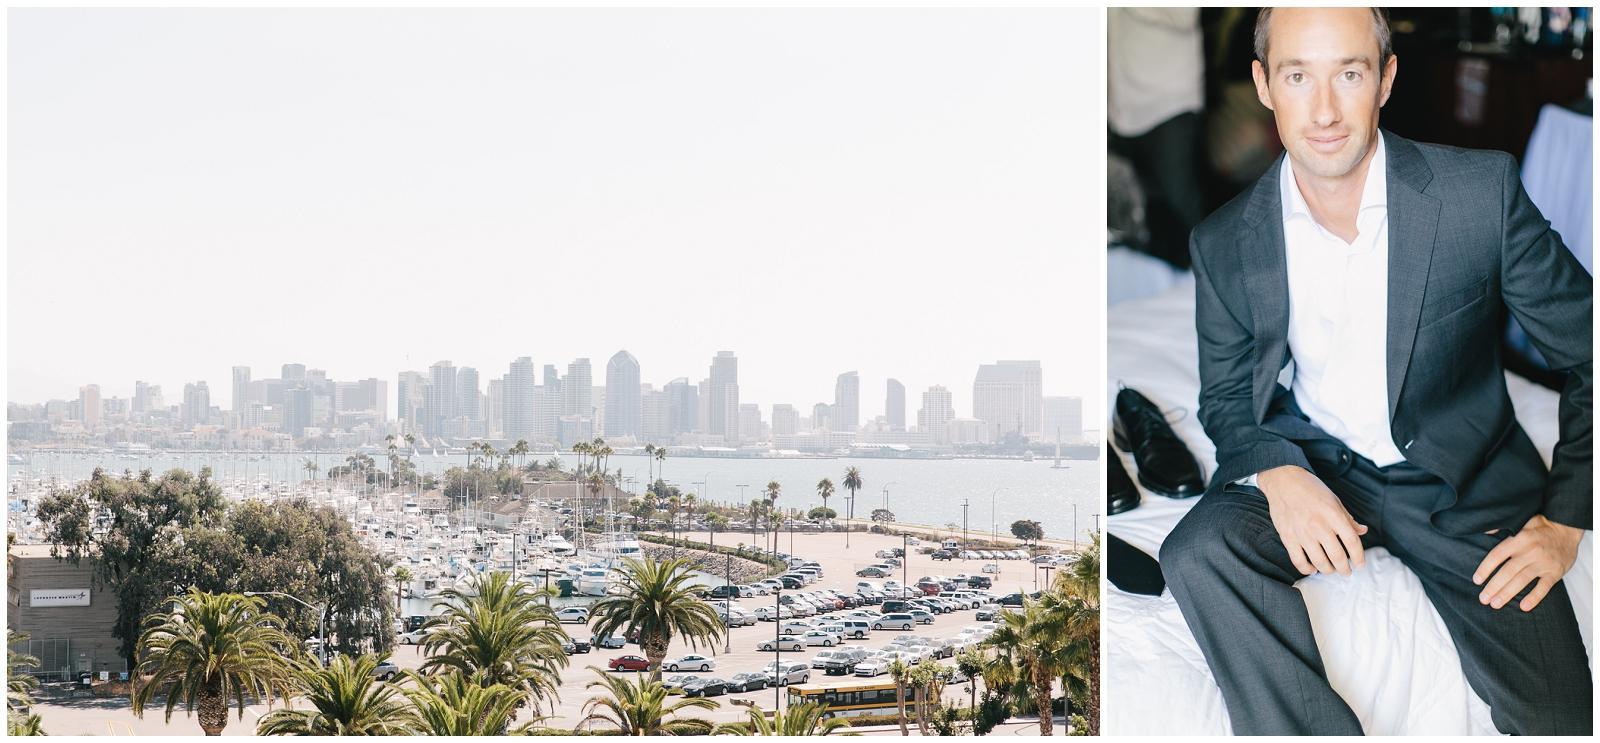 San-Francisco-Bay-Area-Wedding-Photography-Destination-3.jpg